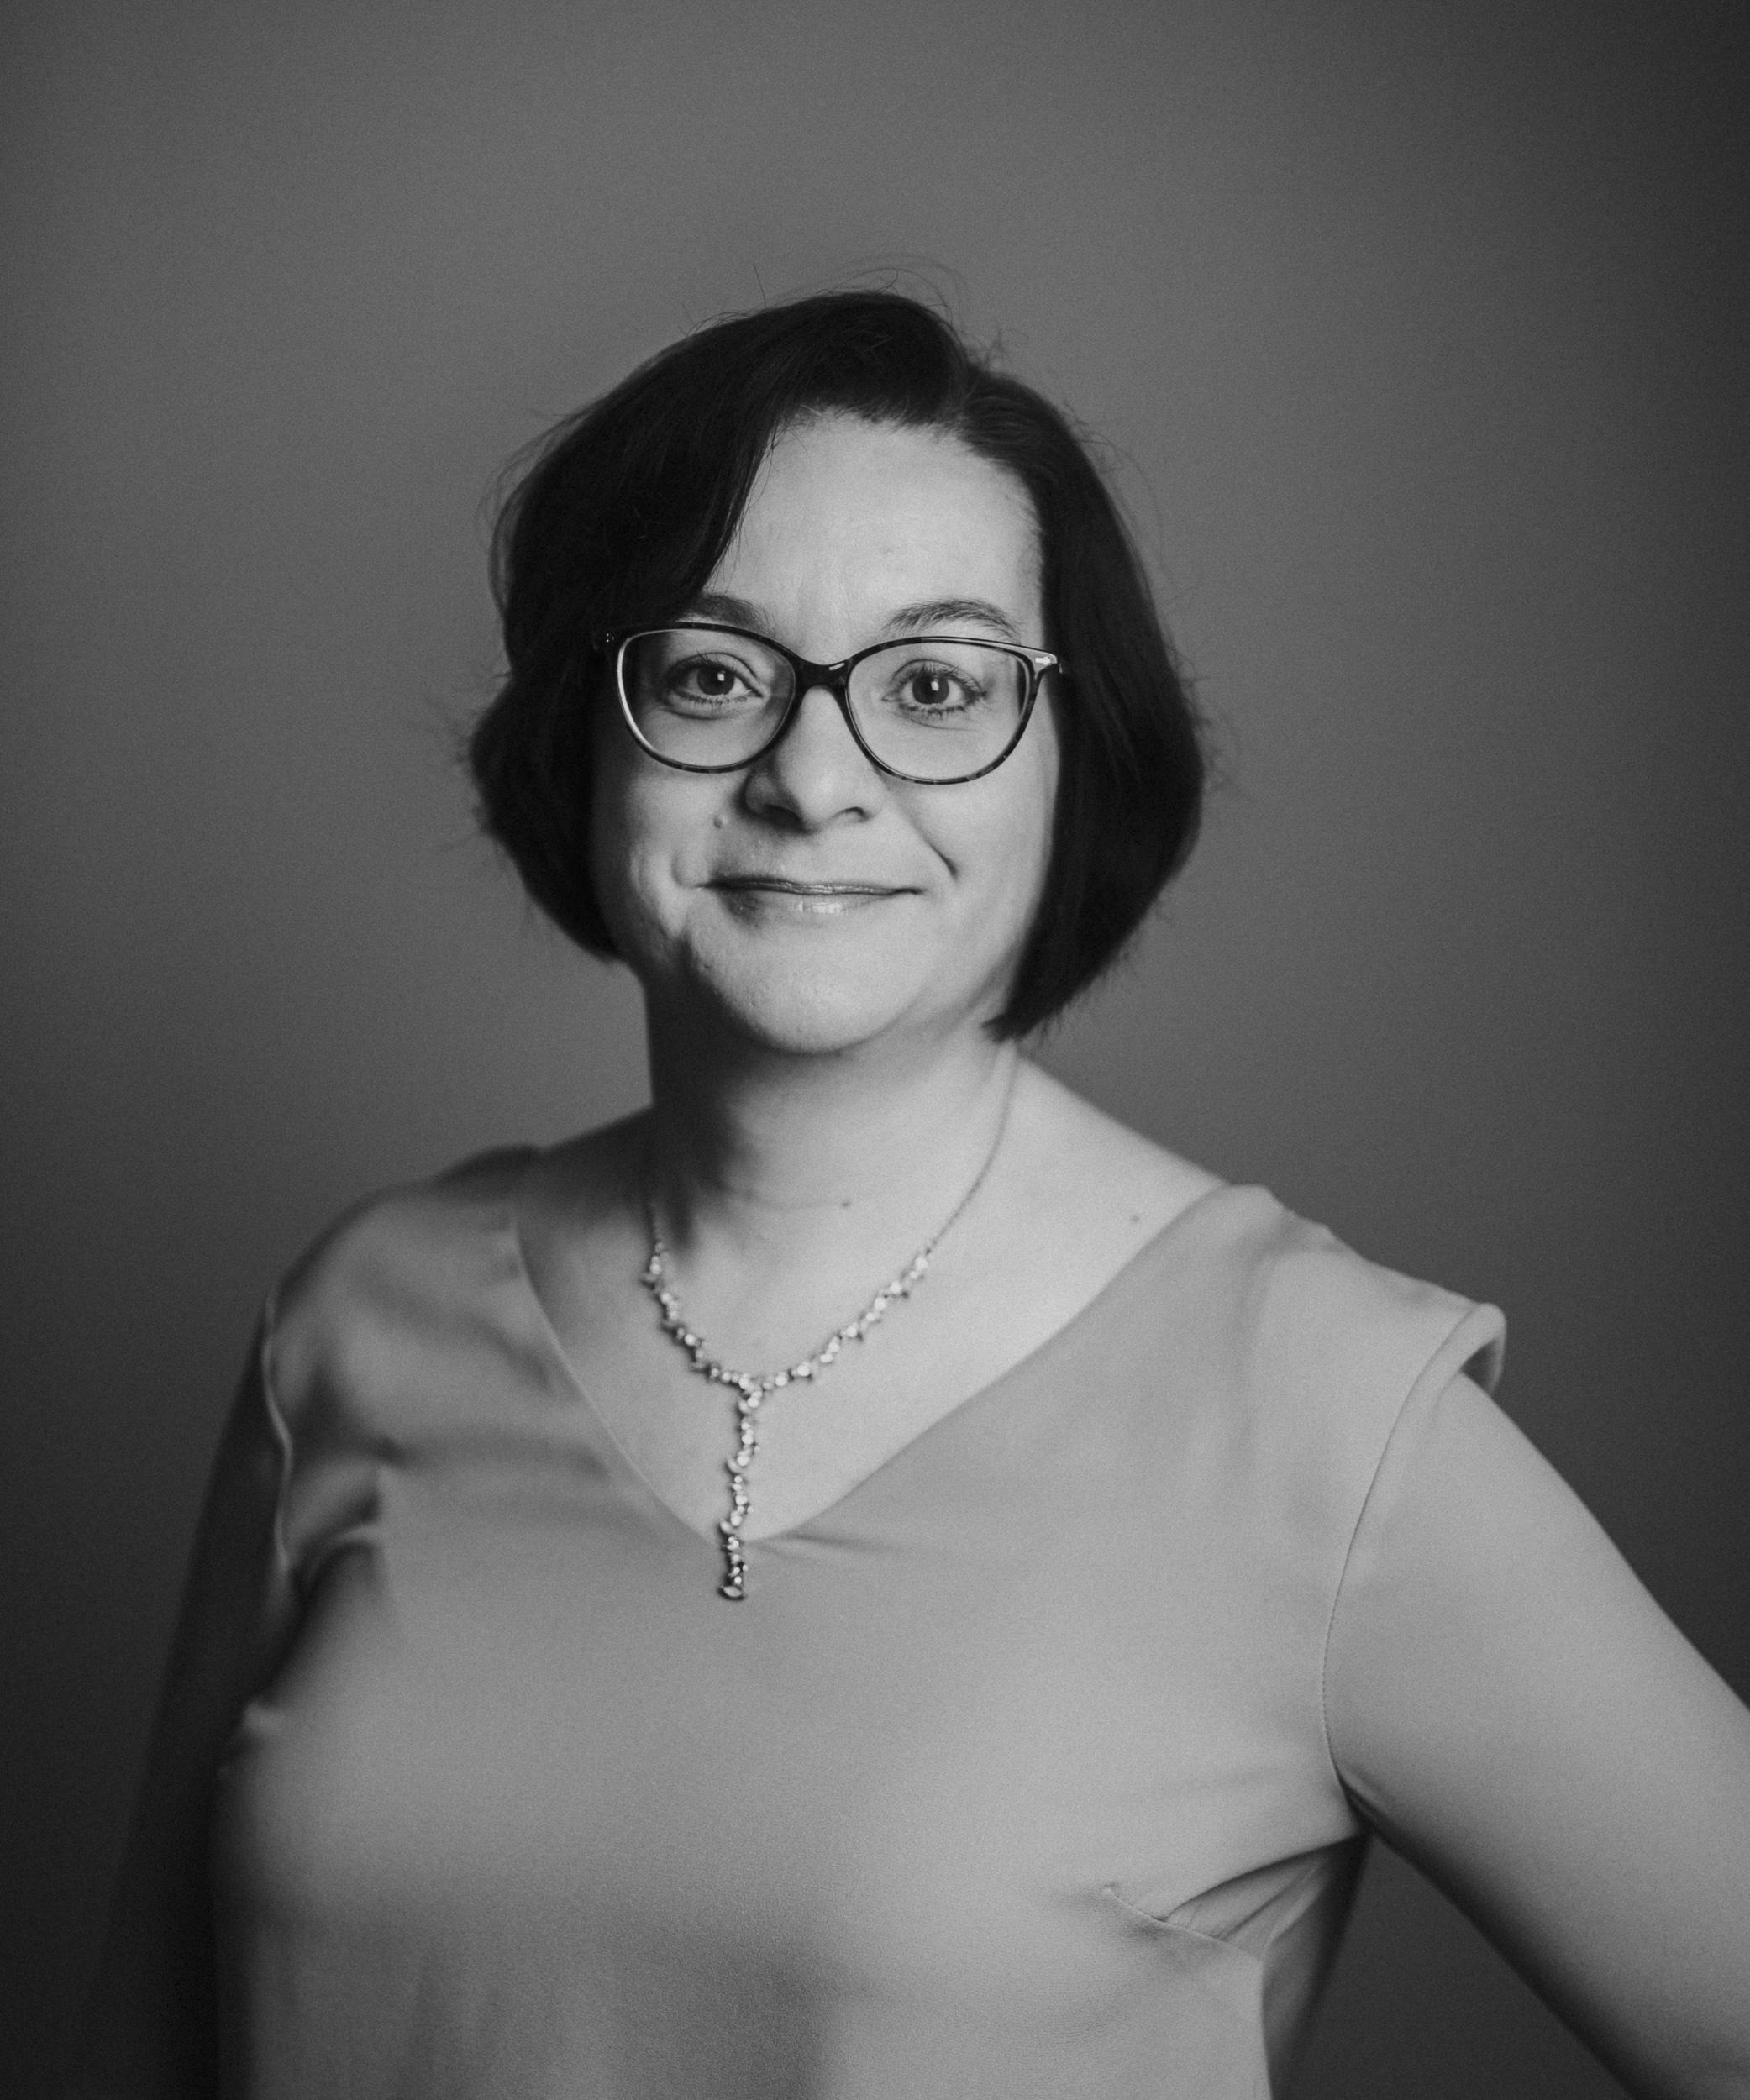 Karmen-Meyer-Photography-genuine-portrait-series-6922.jpg